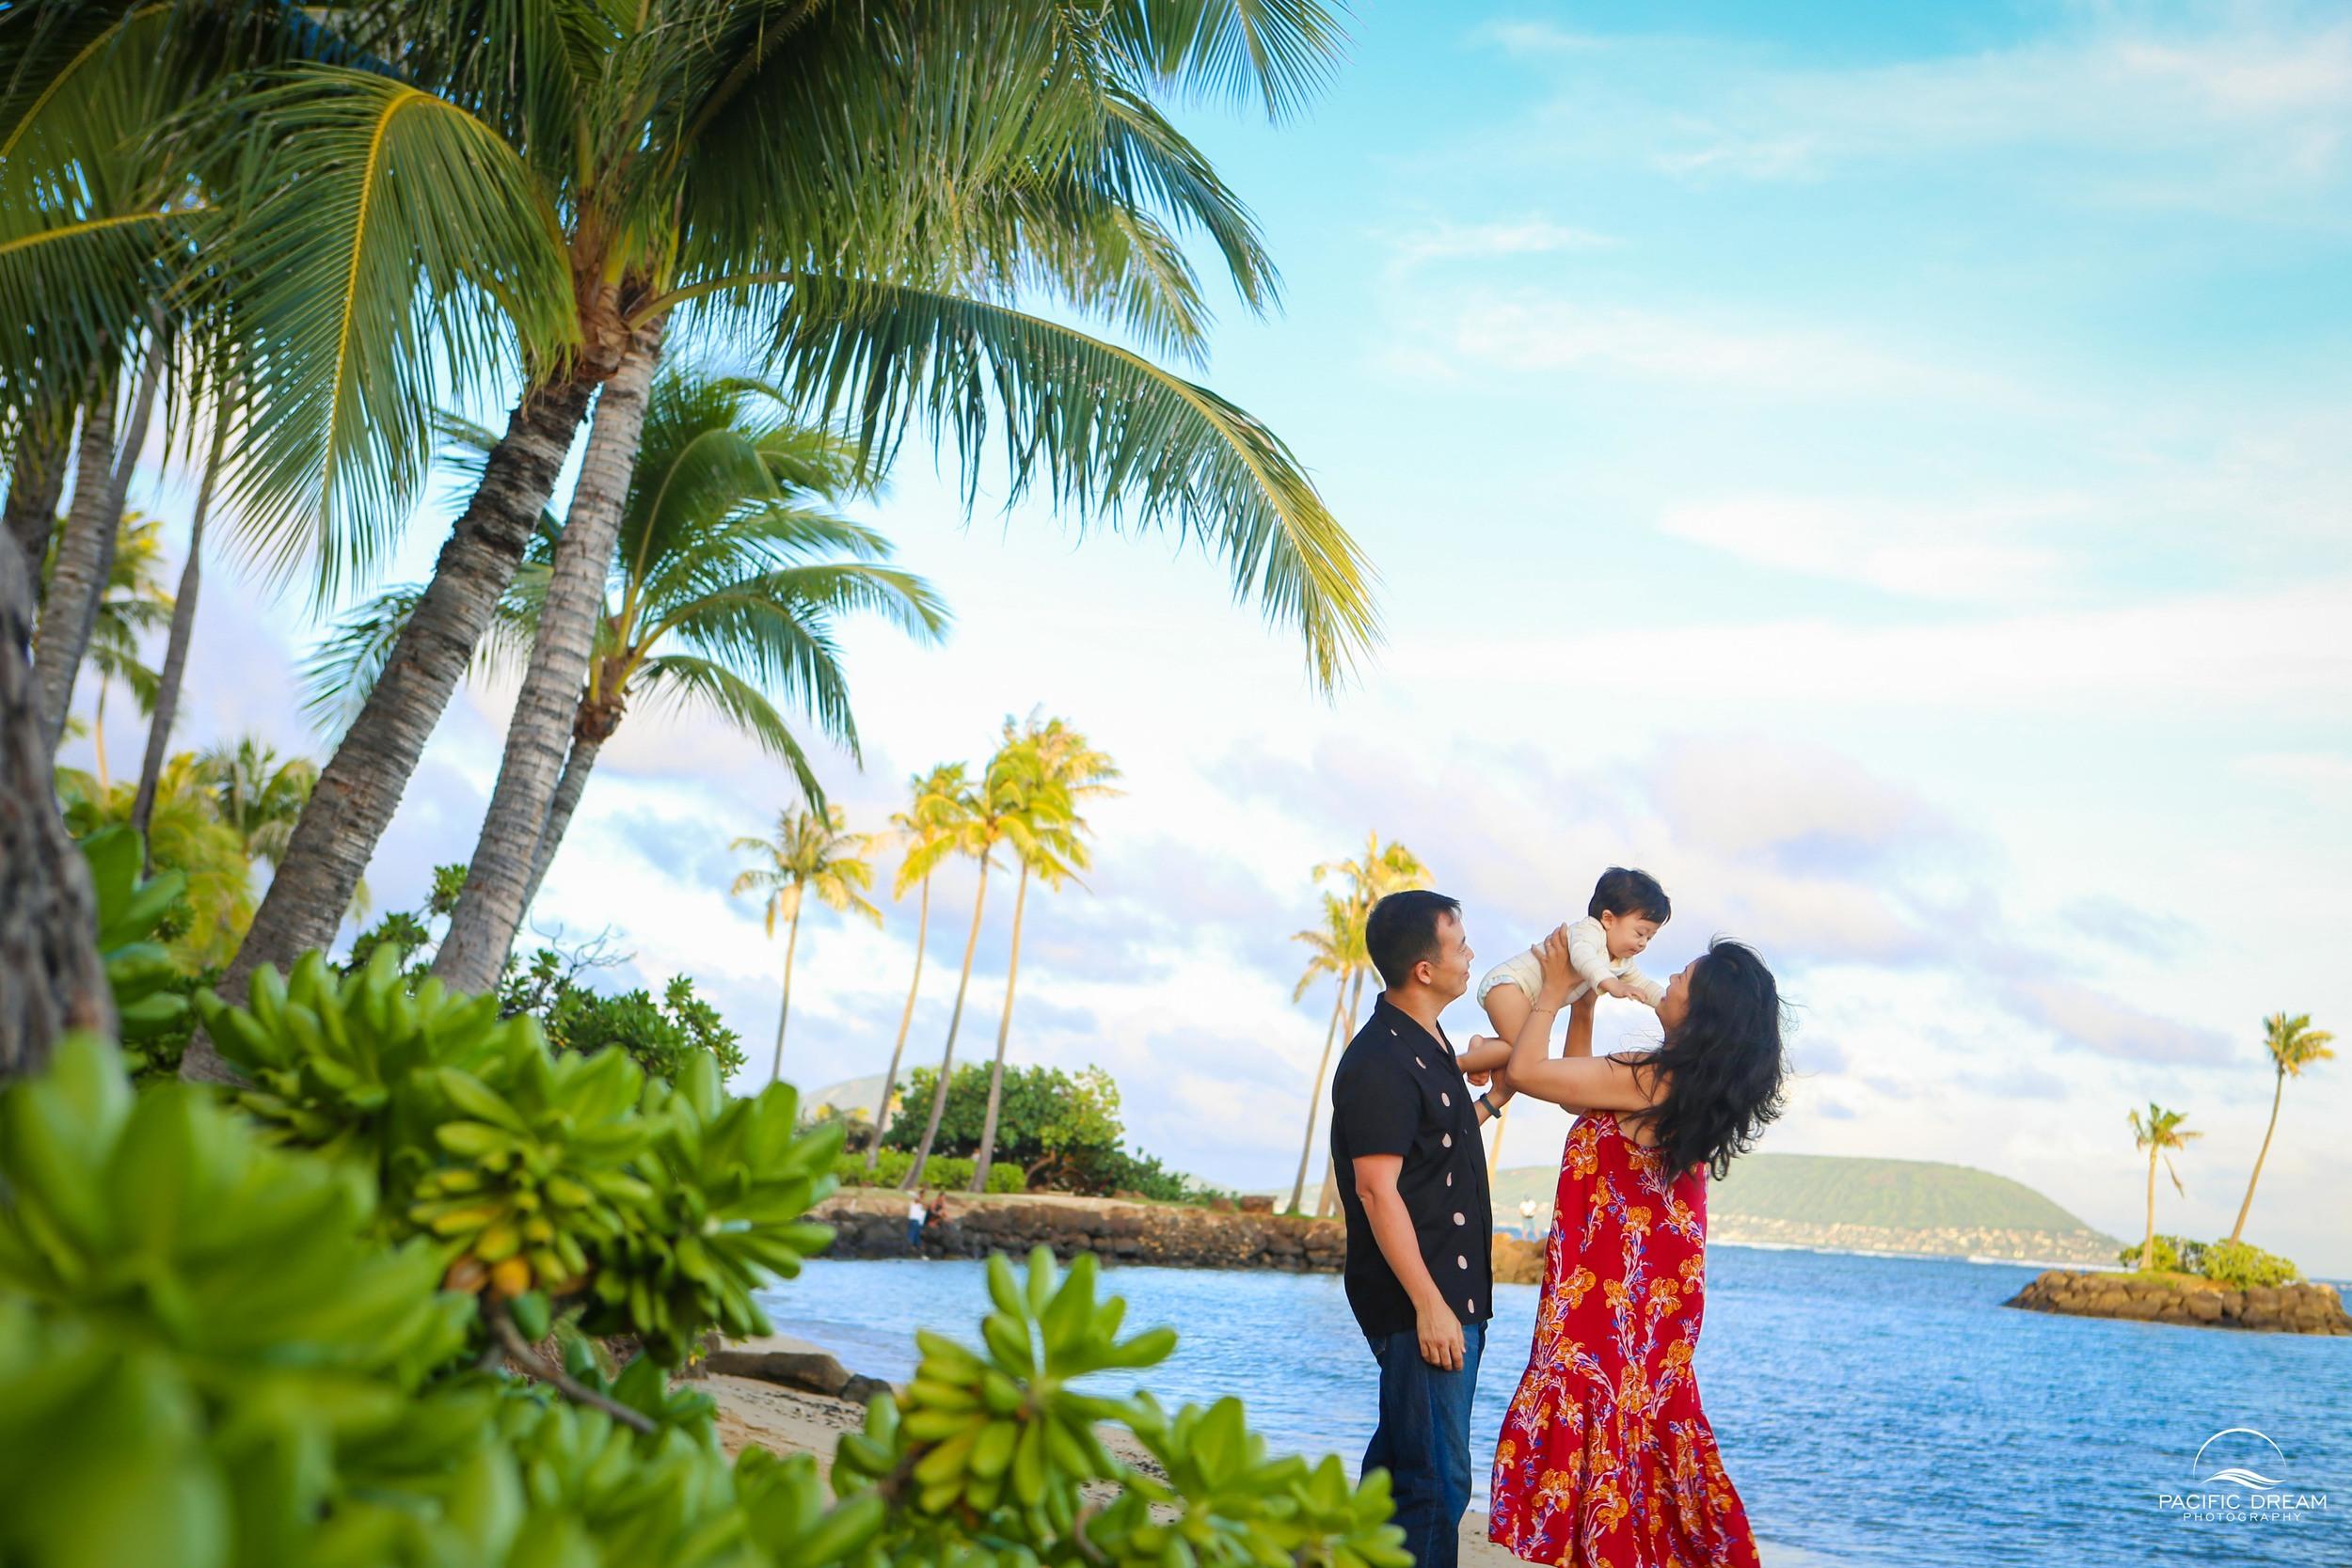 Family photo session in Hawaii, Hawaii Photographer, Pacific Dream Photography, Photographer in Hawaii, Kahala Hotel